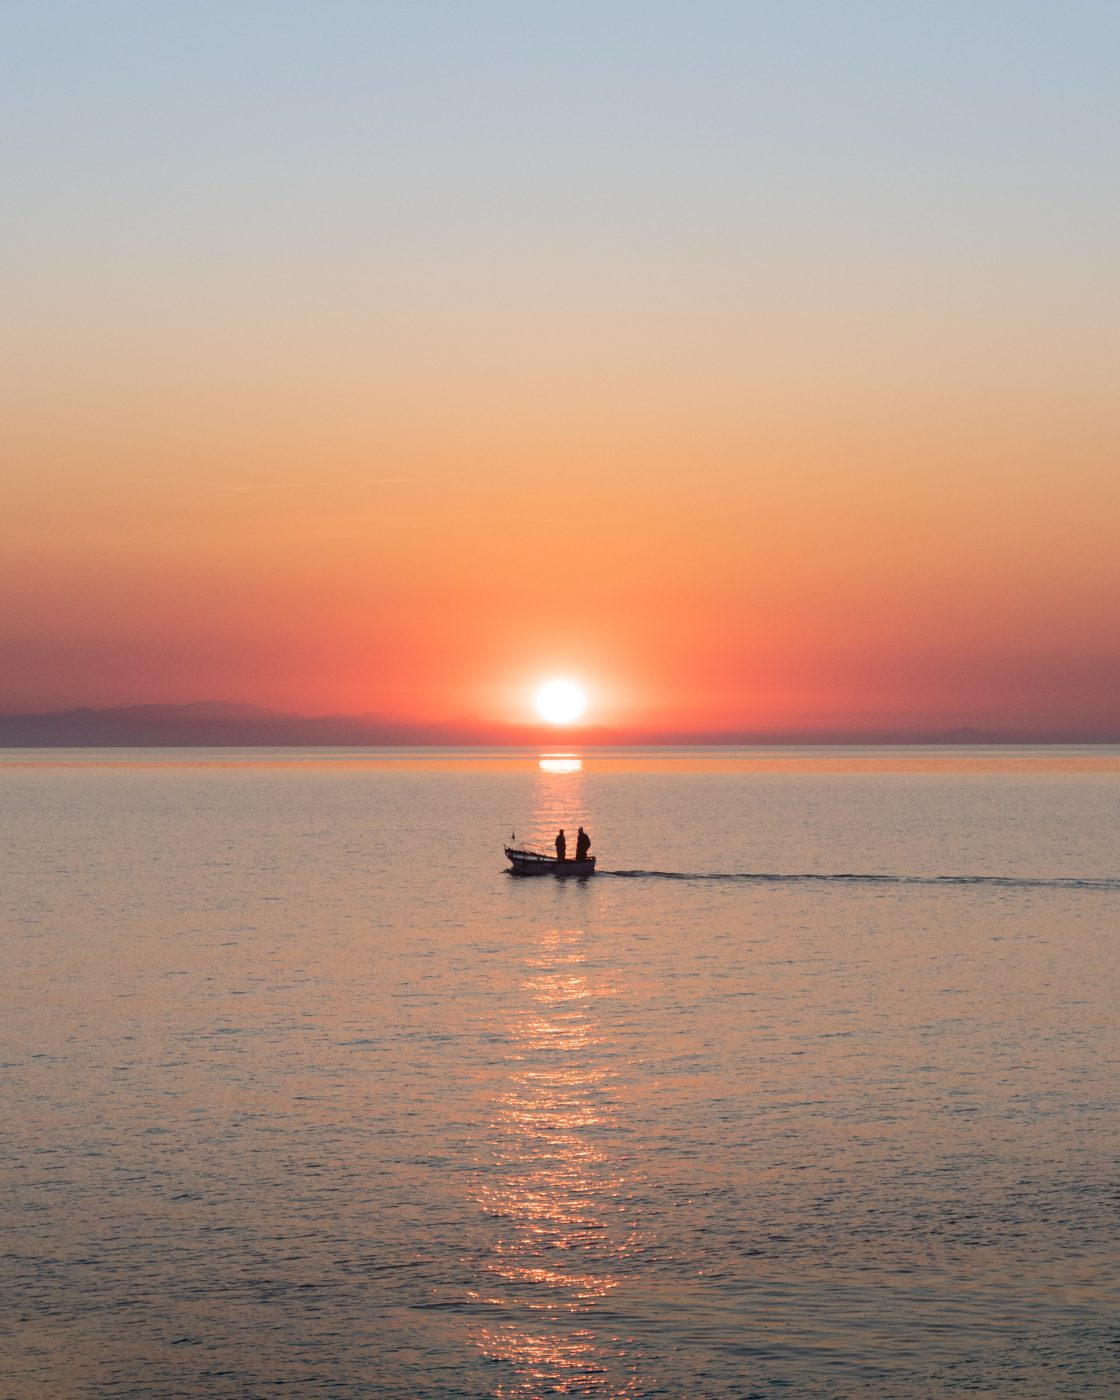 The island of Ventotene